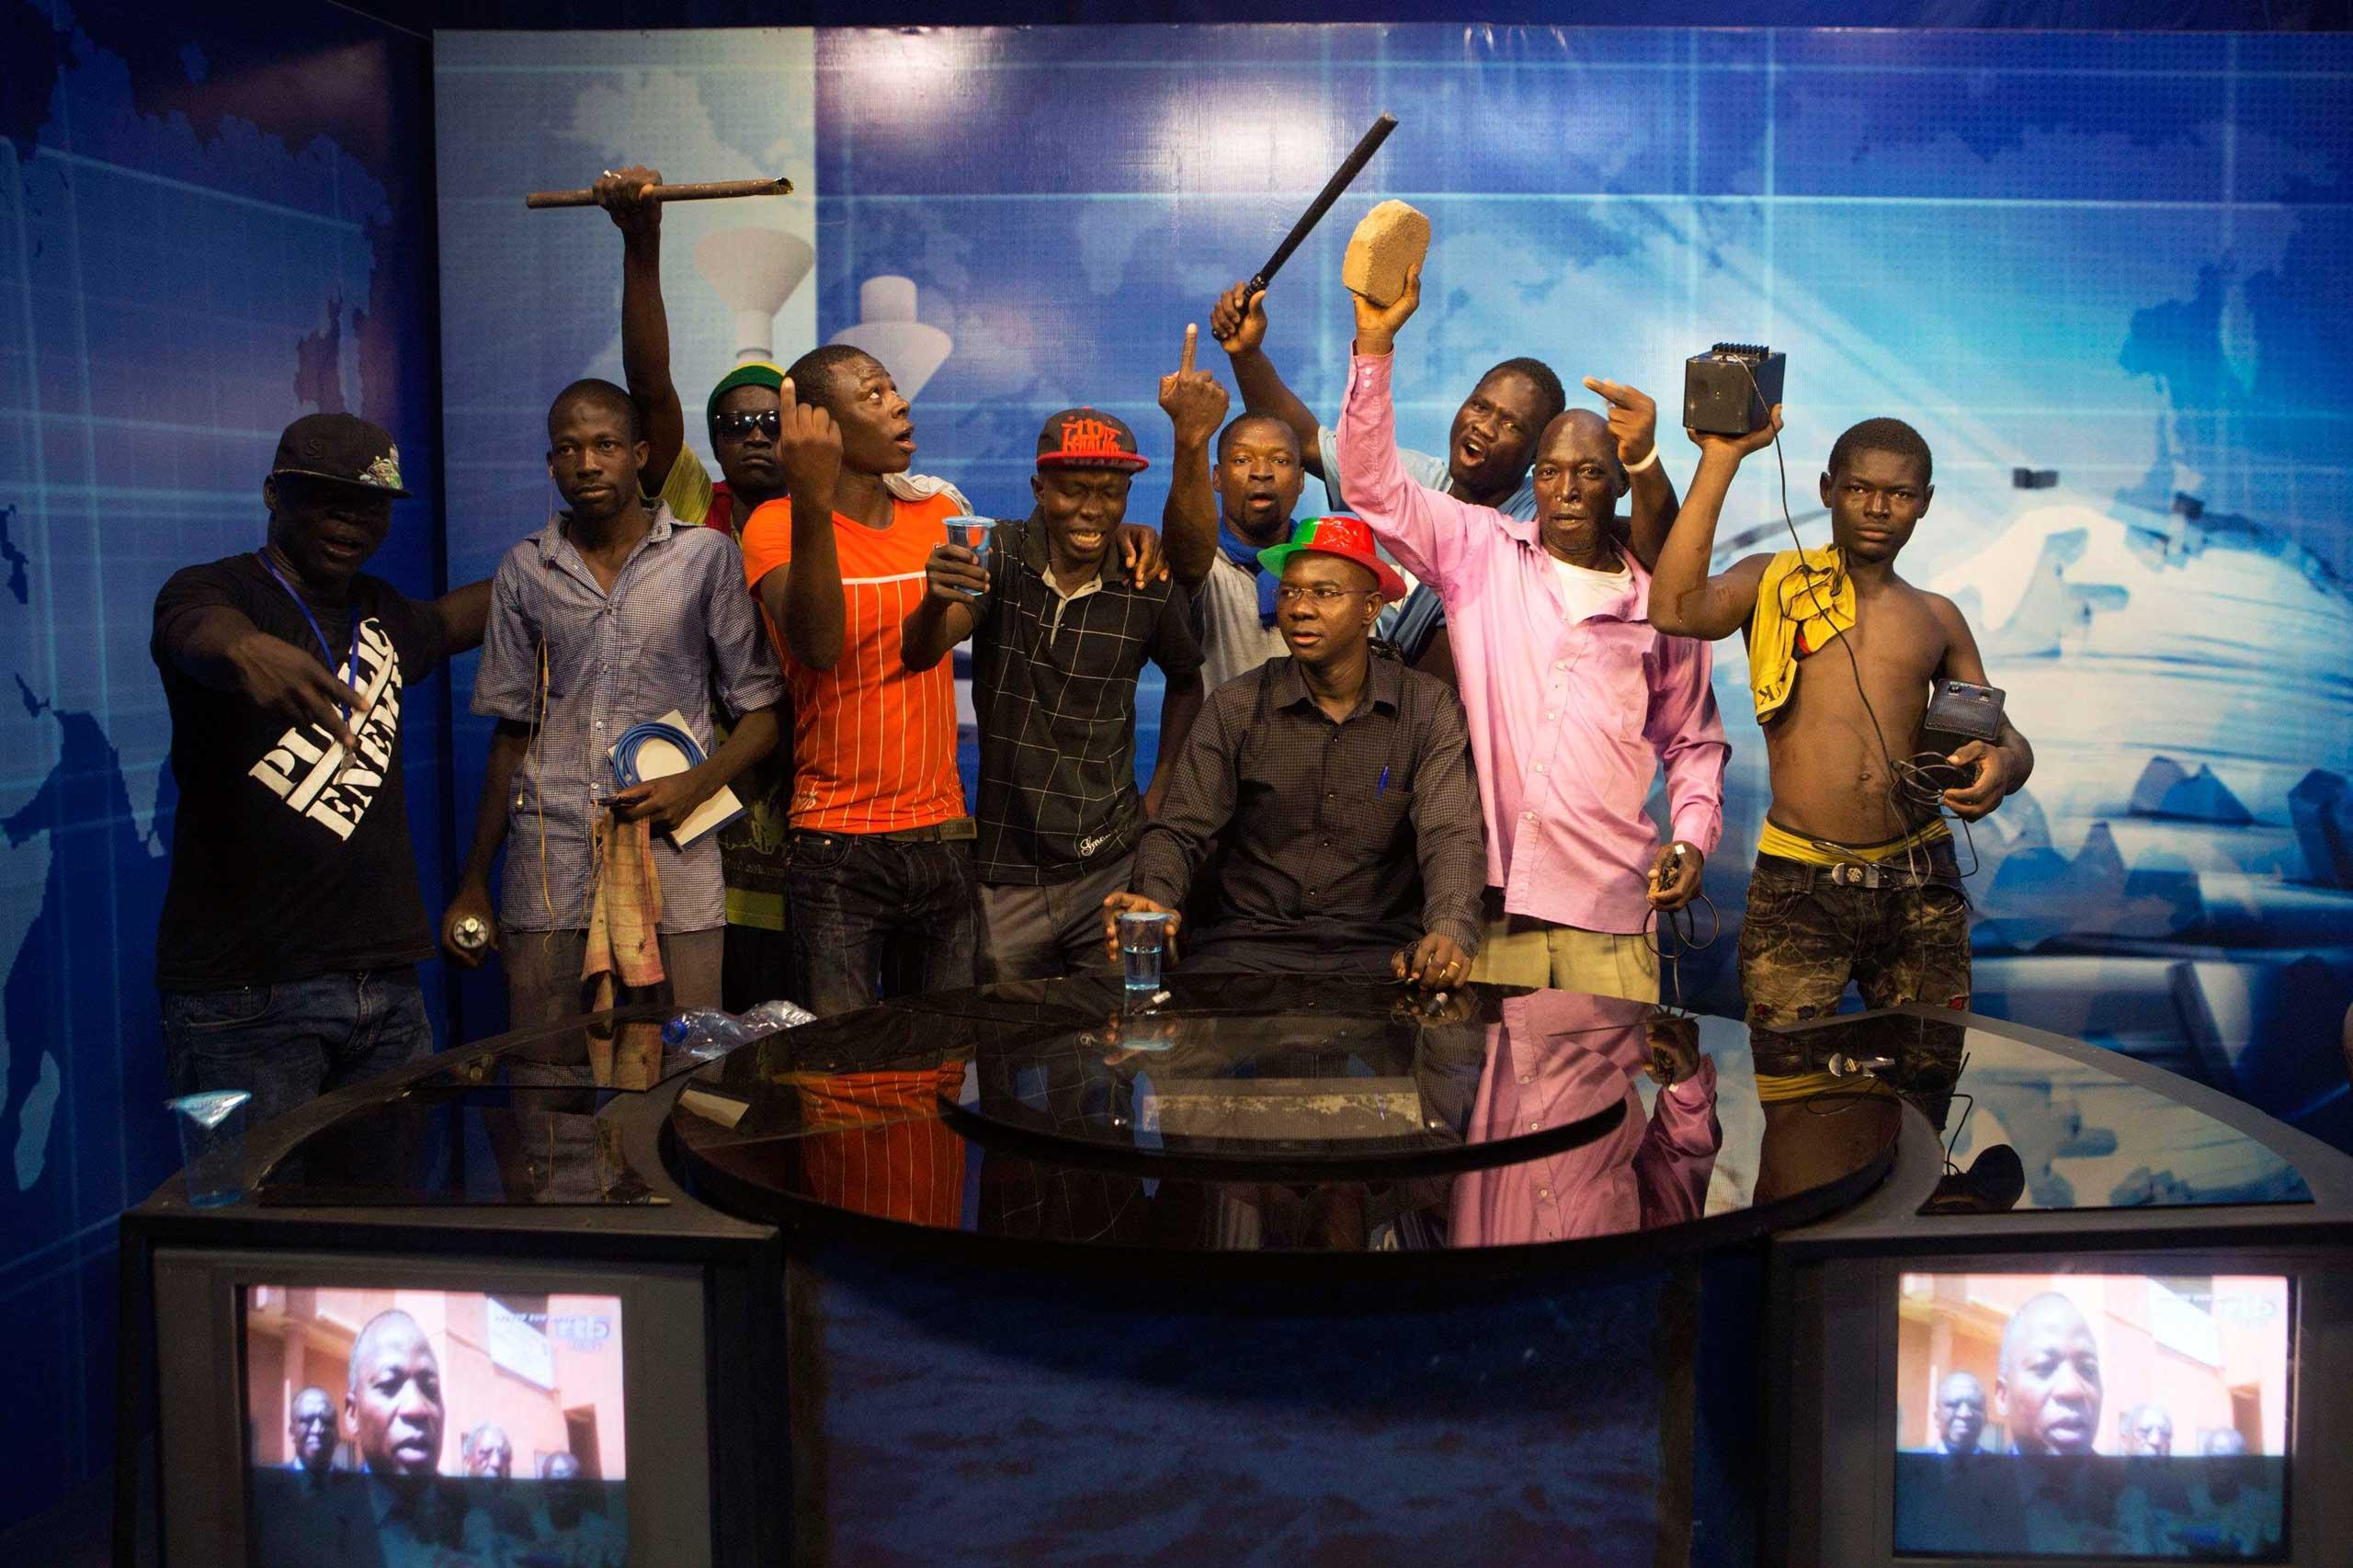 Burkina Faso: Anti-government protests Protesters take over the state TV podium in Ouagadougou, capital of Burkina Faso, Oct. 30, 2014.